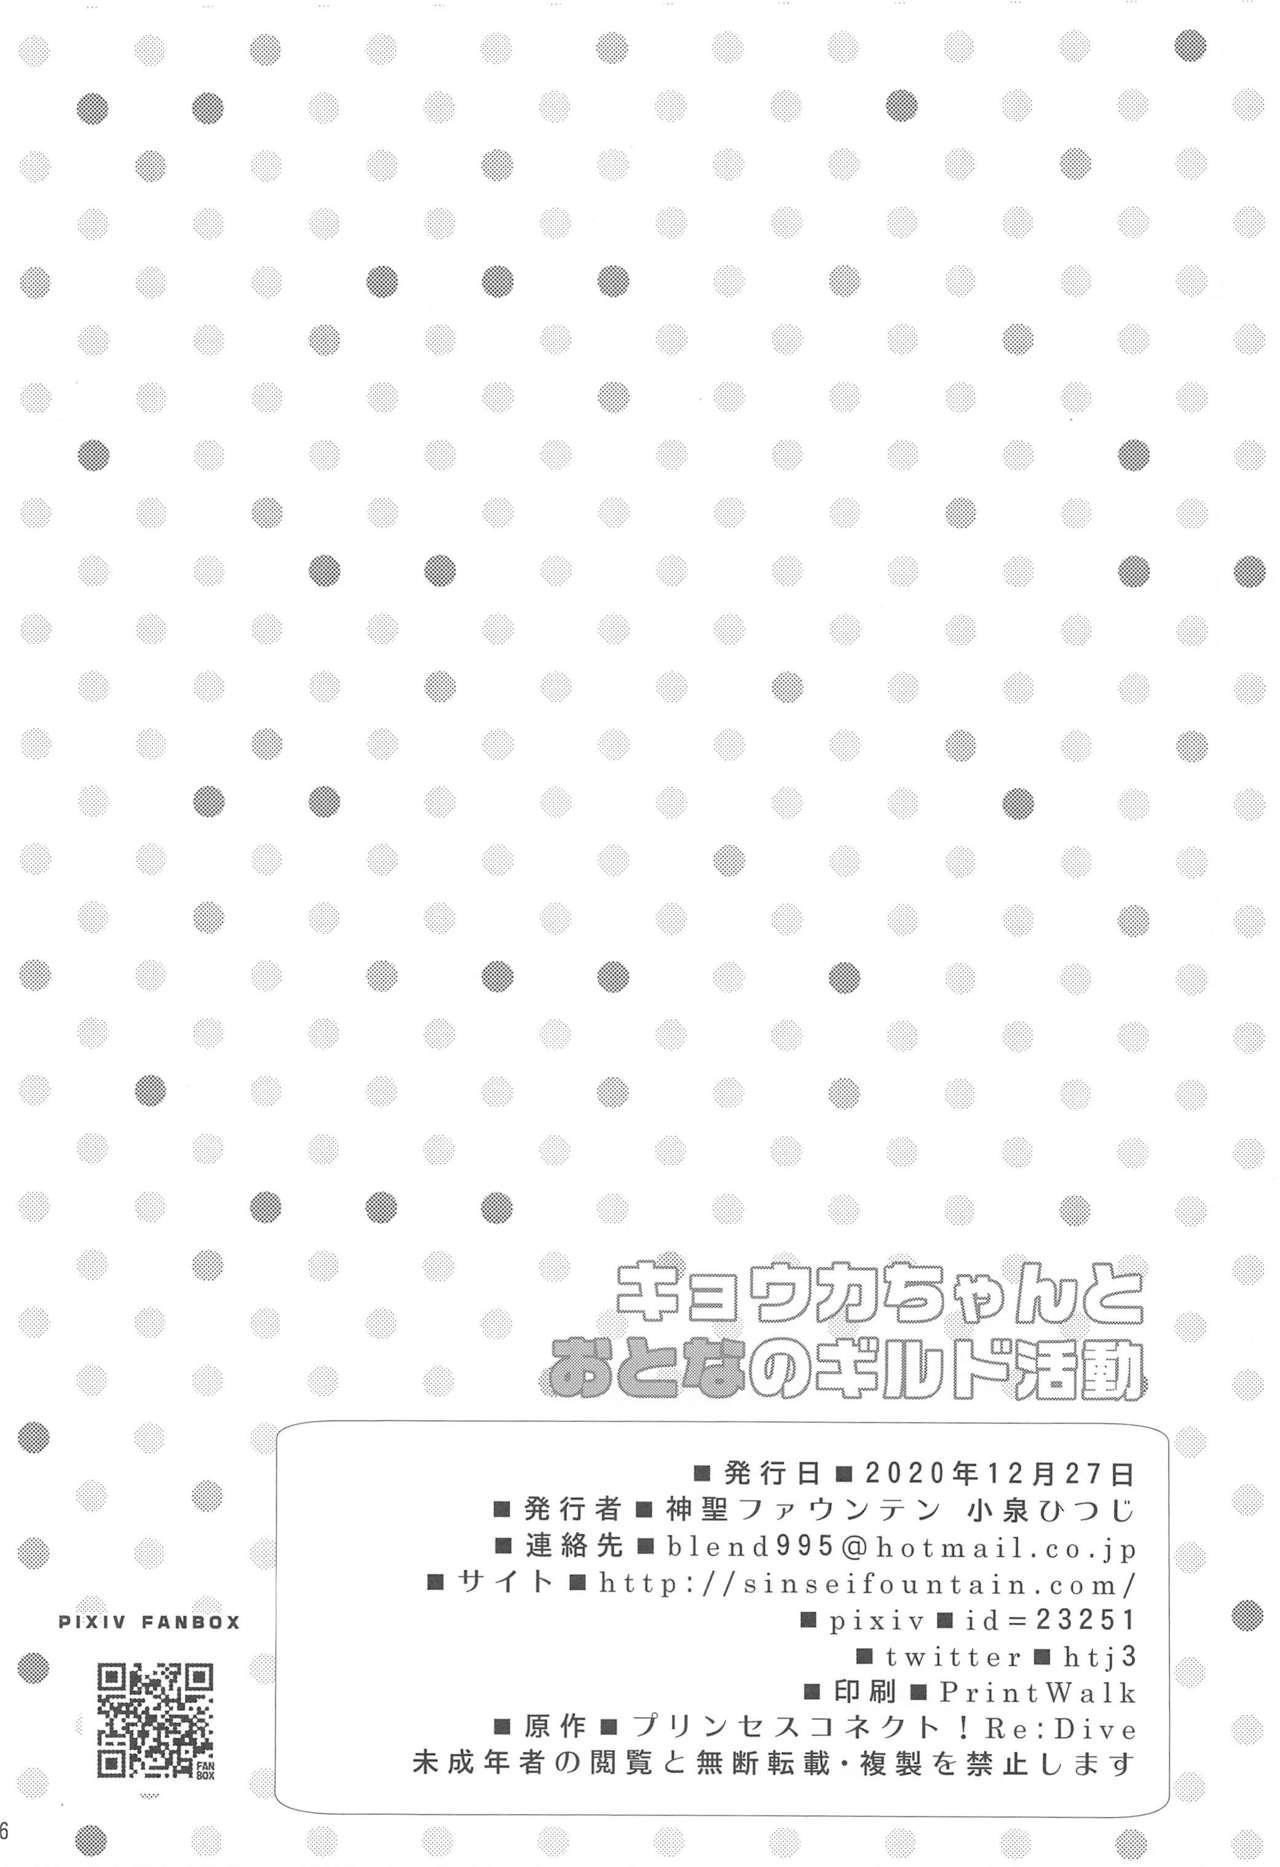 Kyouka-chan to Otona no Guild Katsudou 24